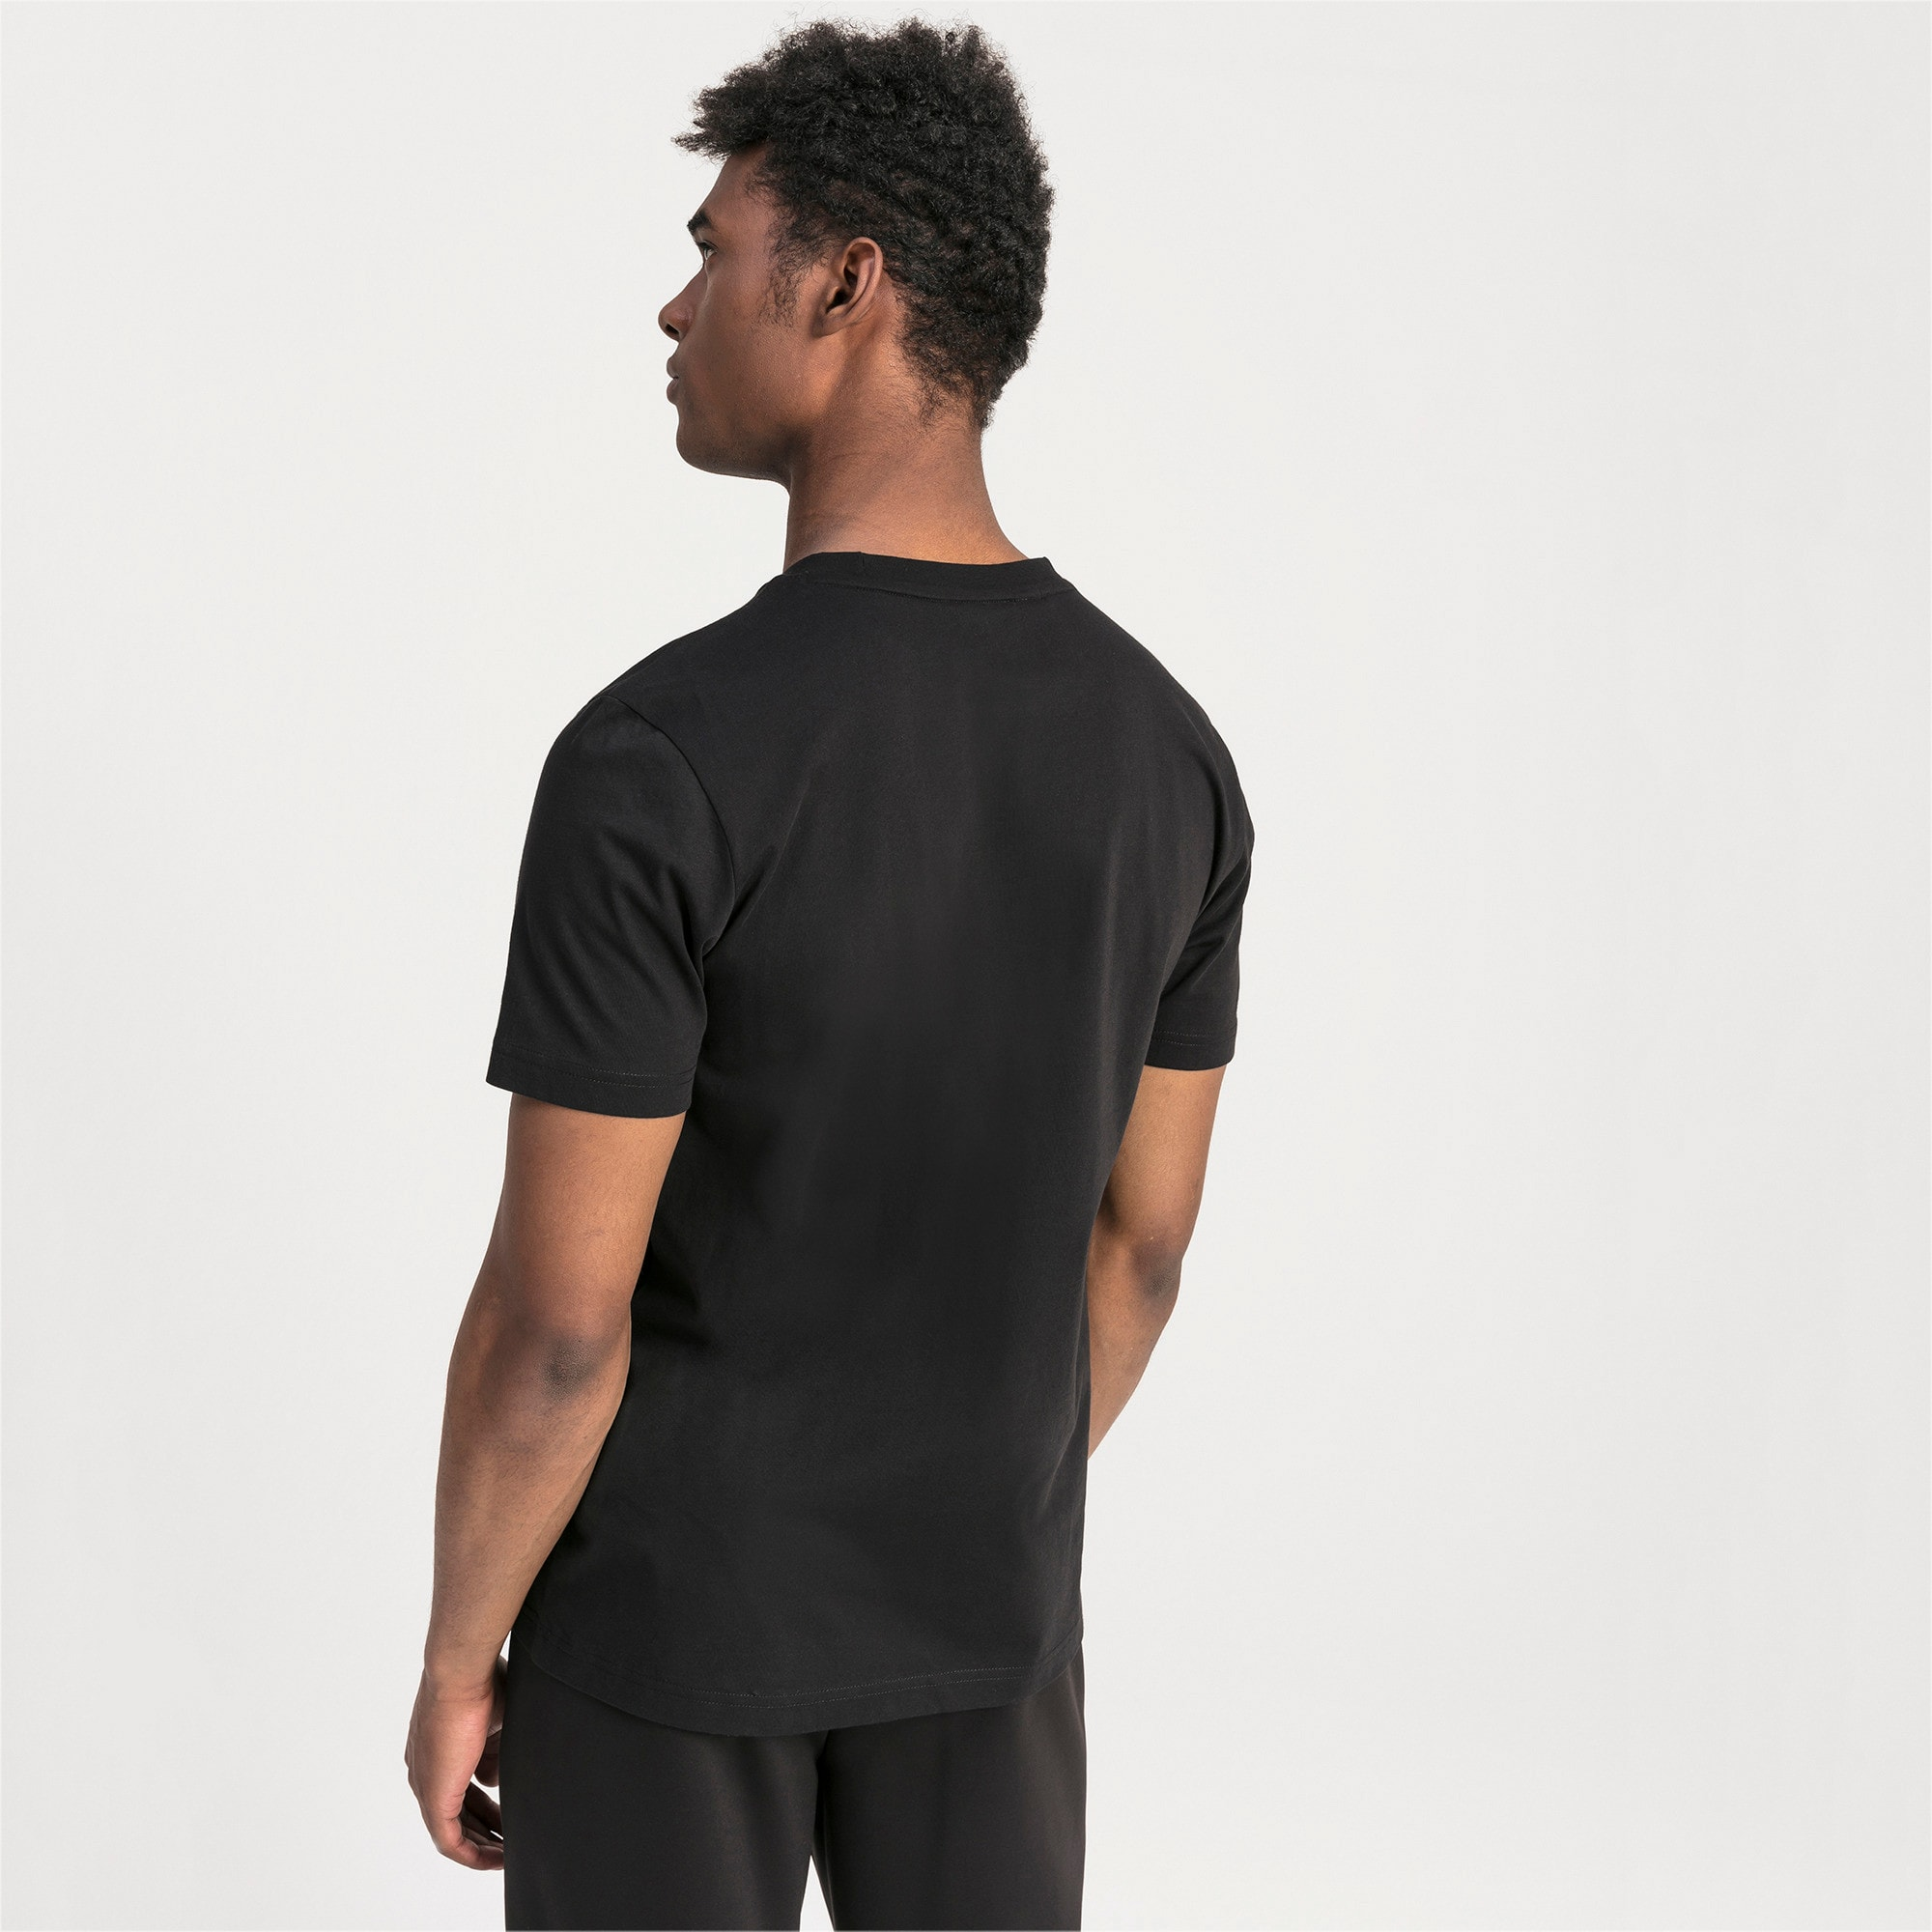 Thumbnail 2 of T-shirt con logo BMW M Motorsport uomo, Puma Black, medium